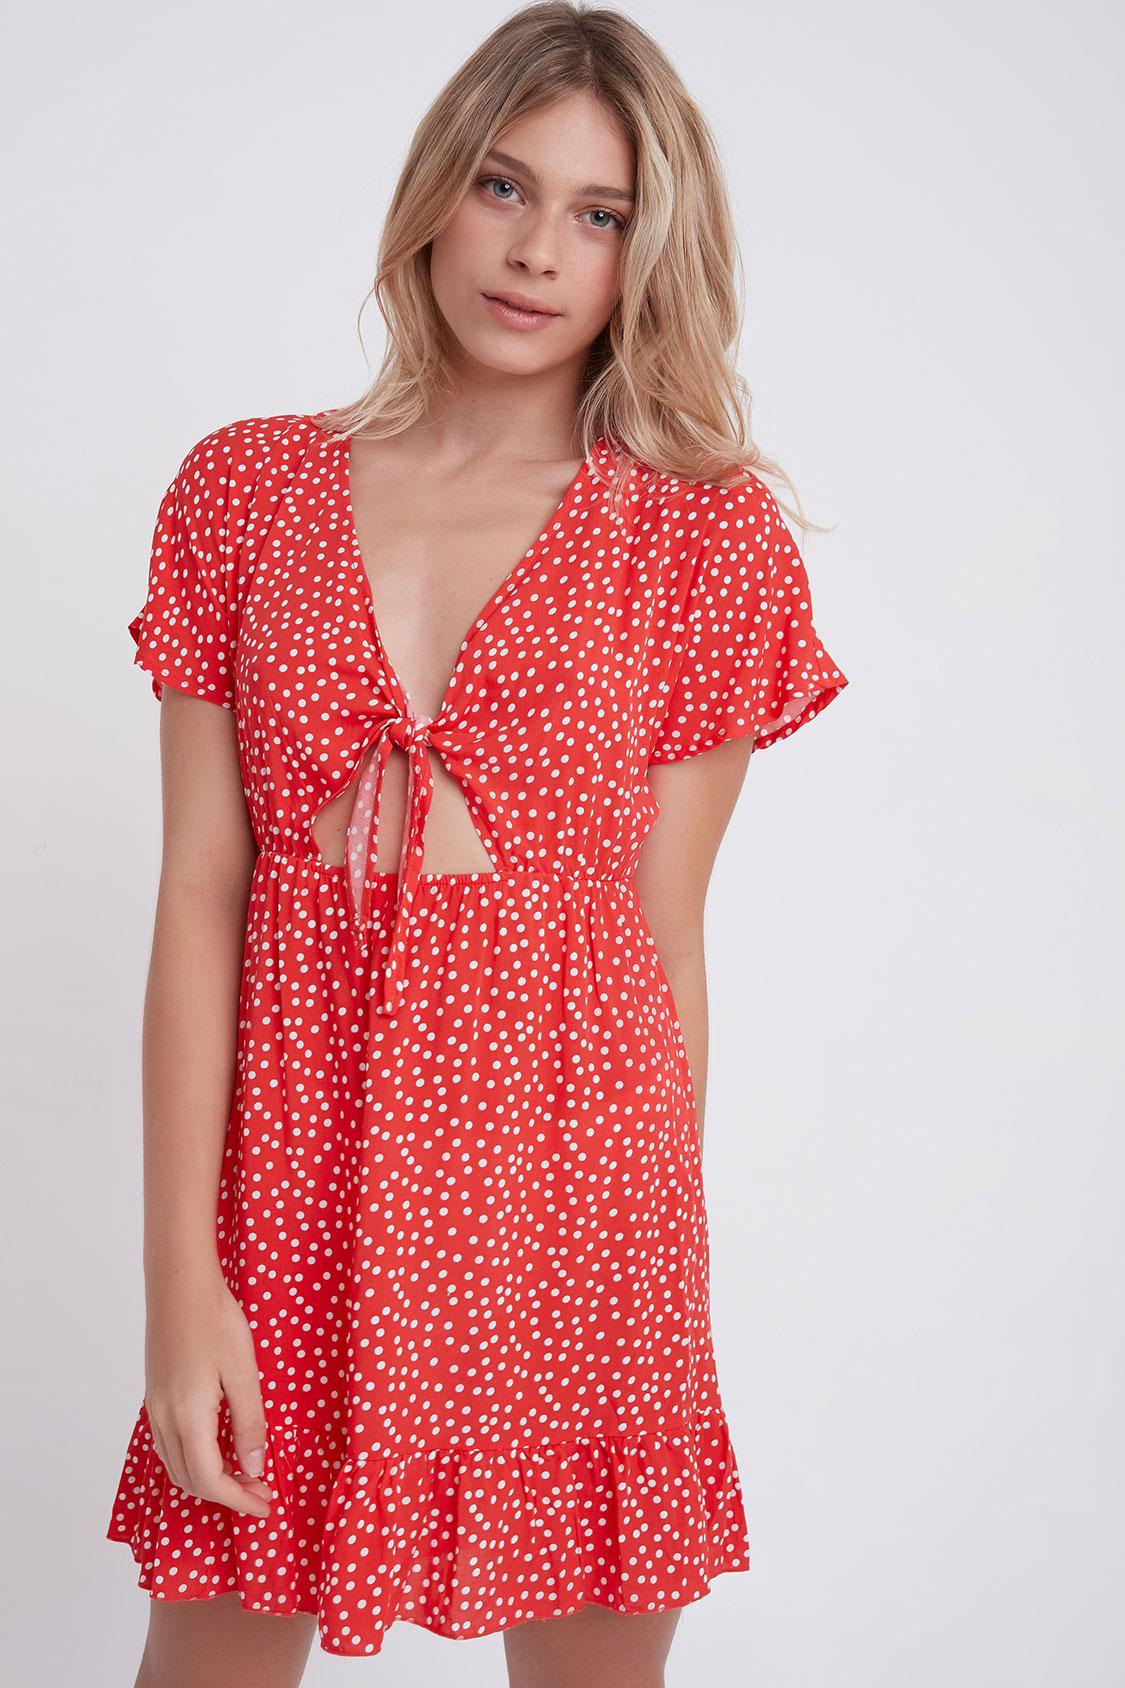 Kleid Schleife